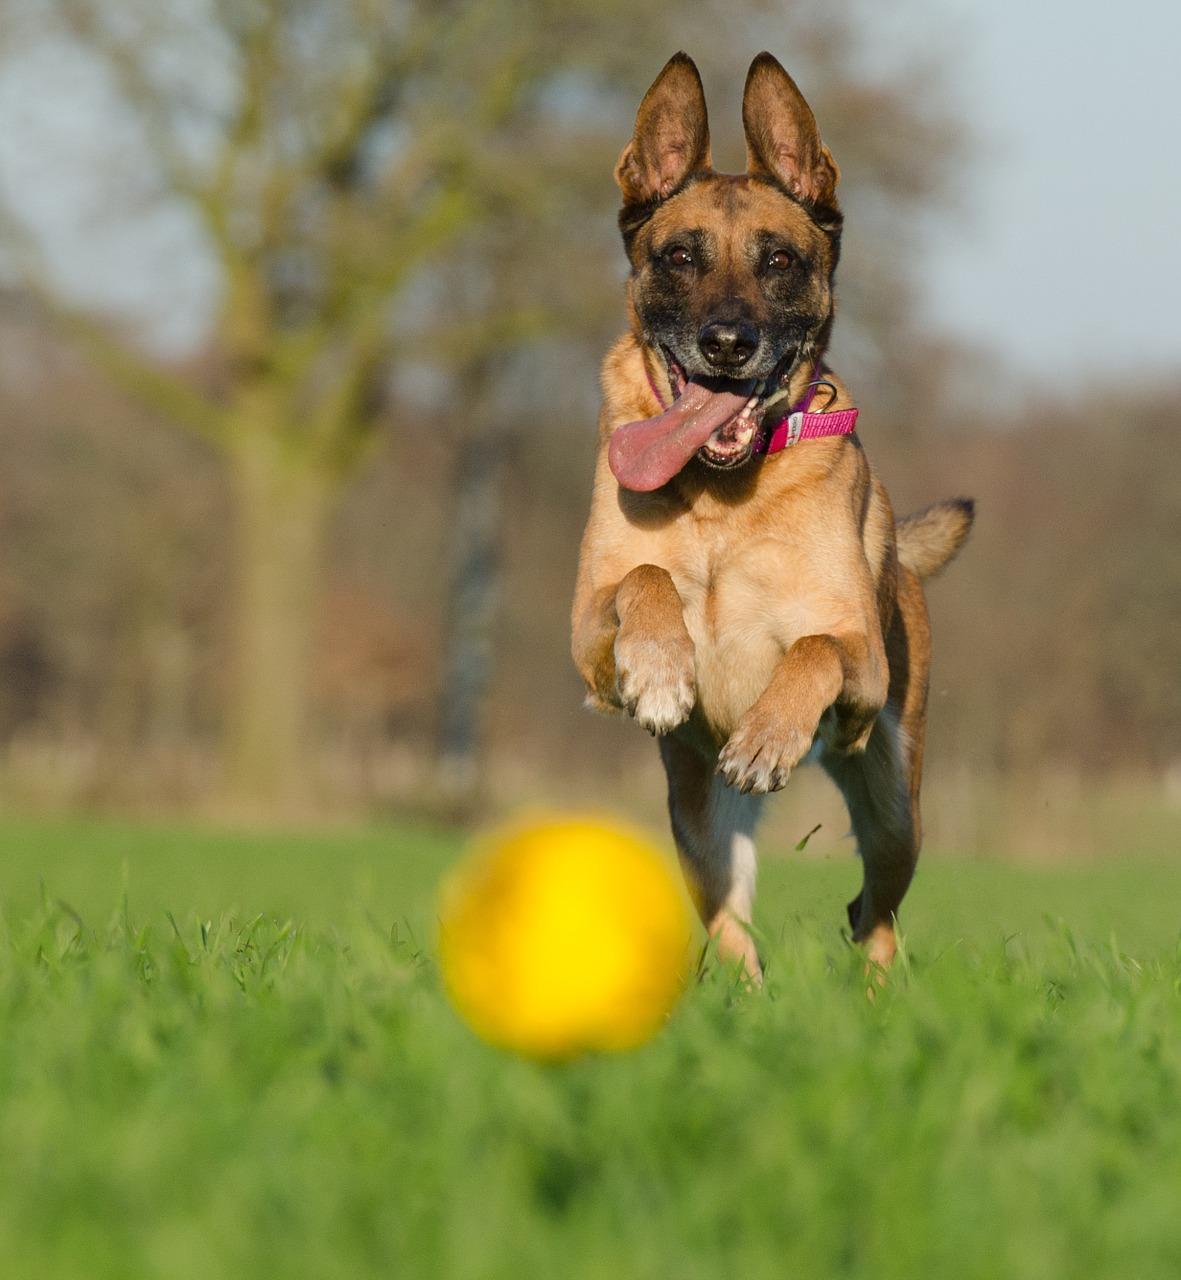 Malinois Shepherd Dogs playing running field ball